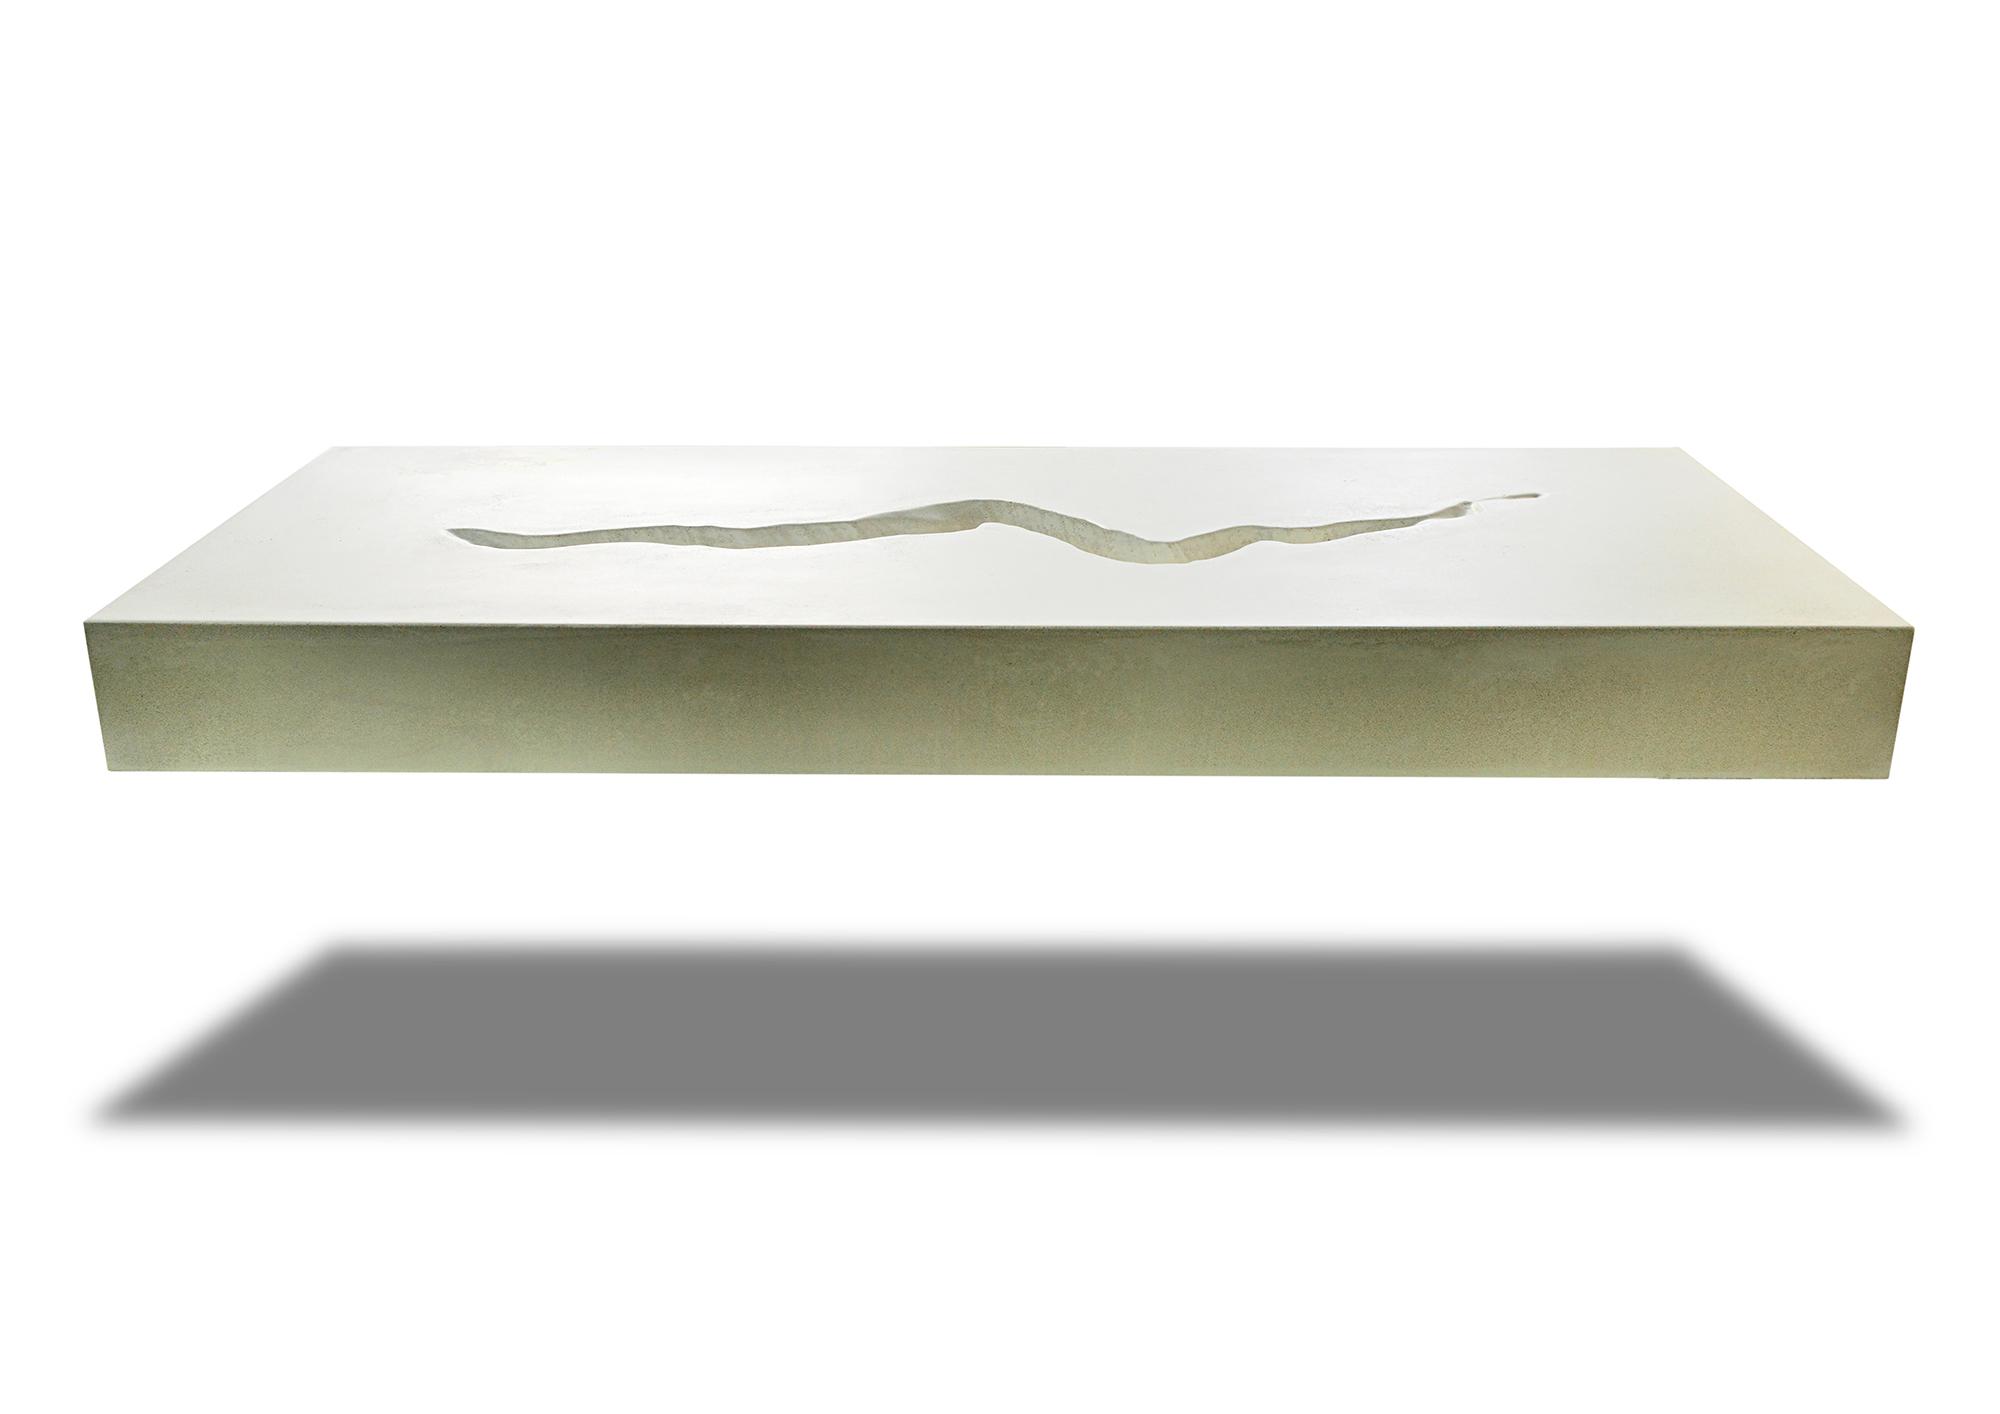 Concrete-crack-sink-white-floating.jpg